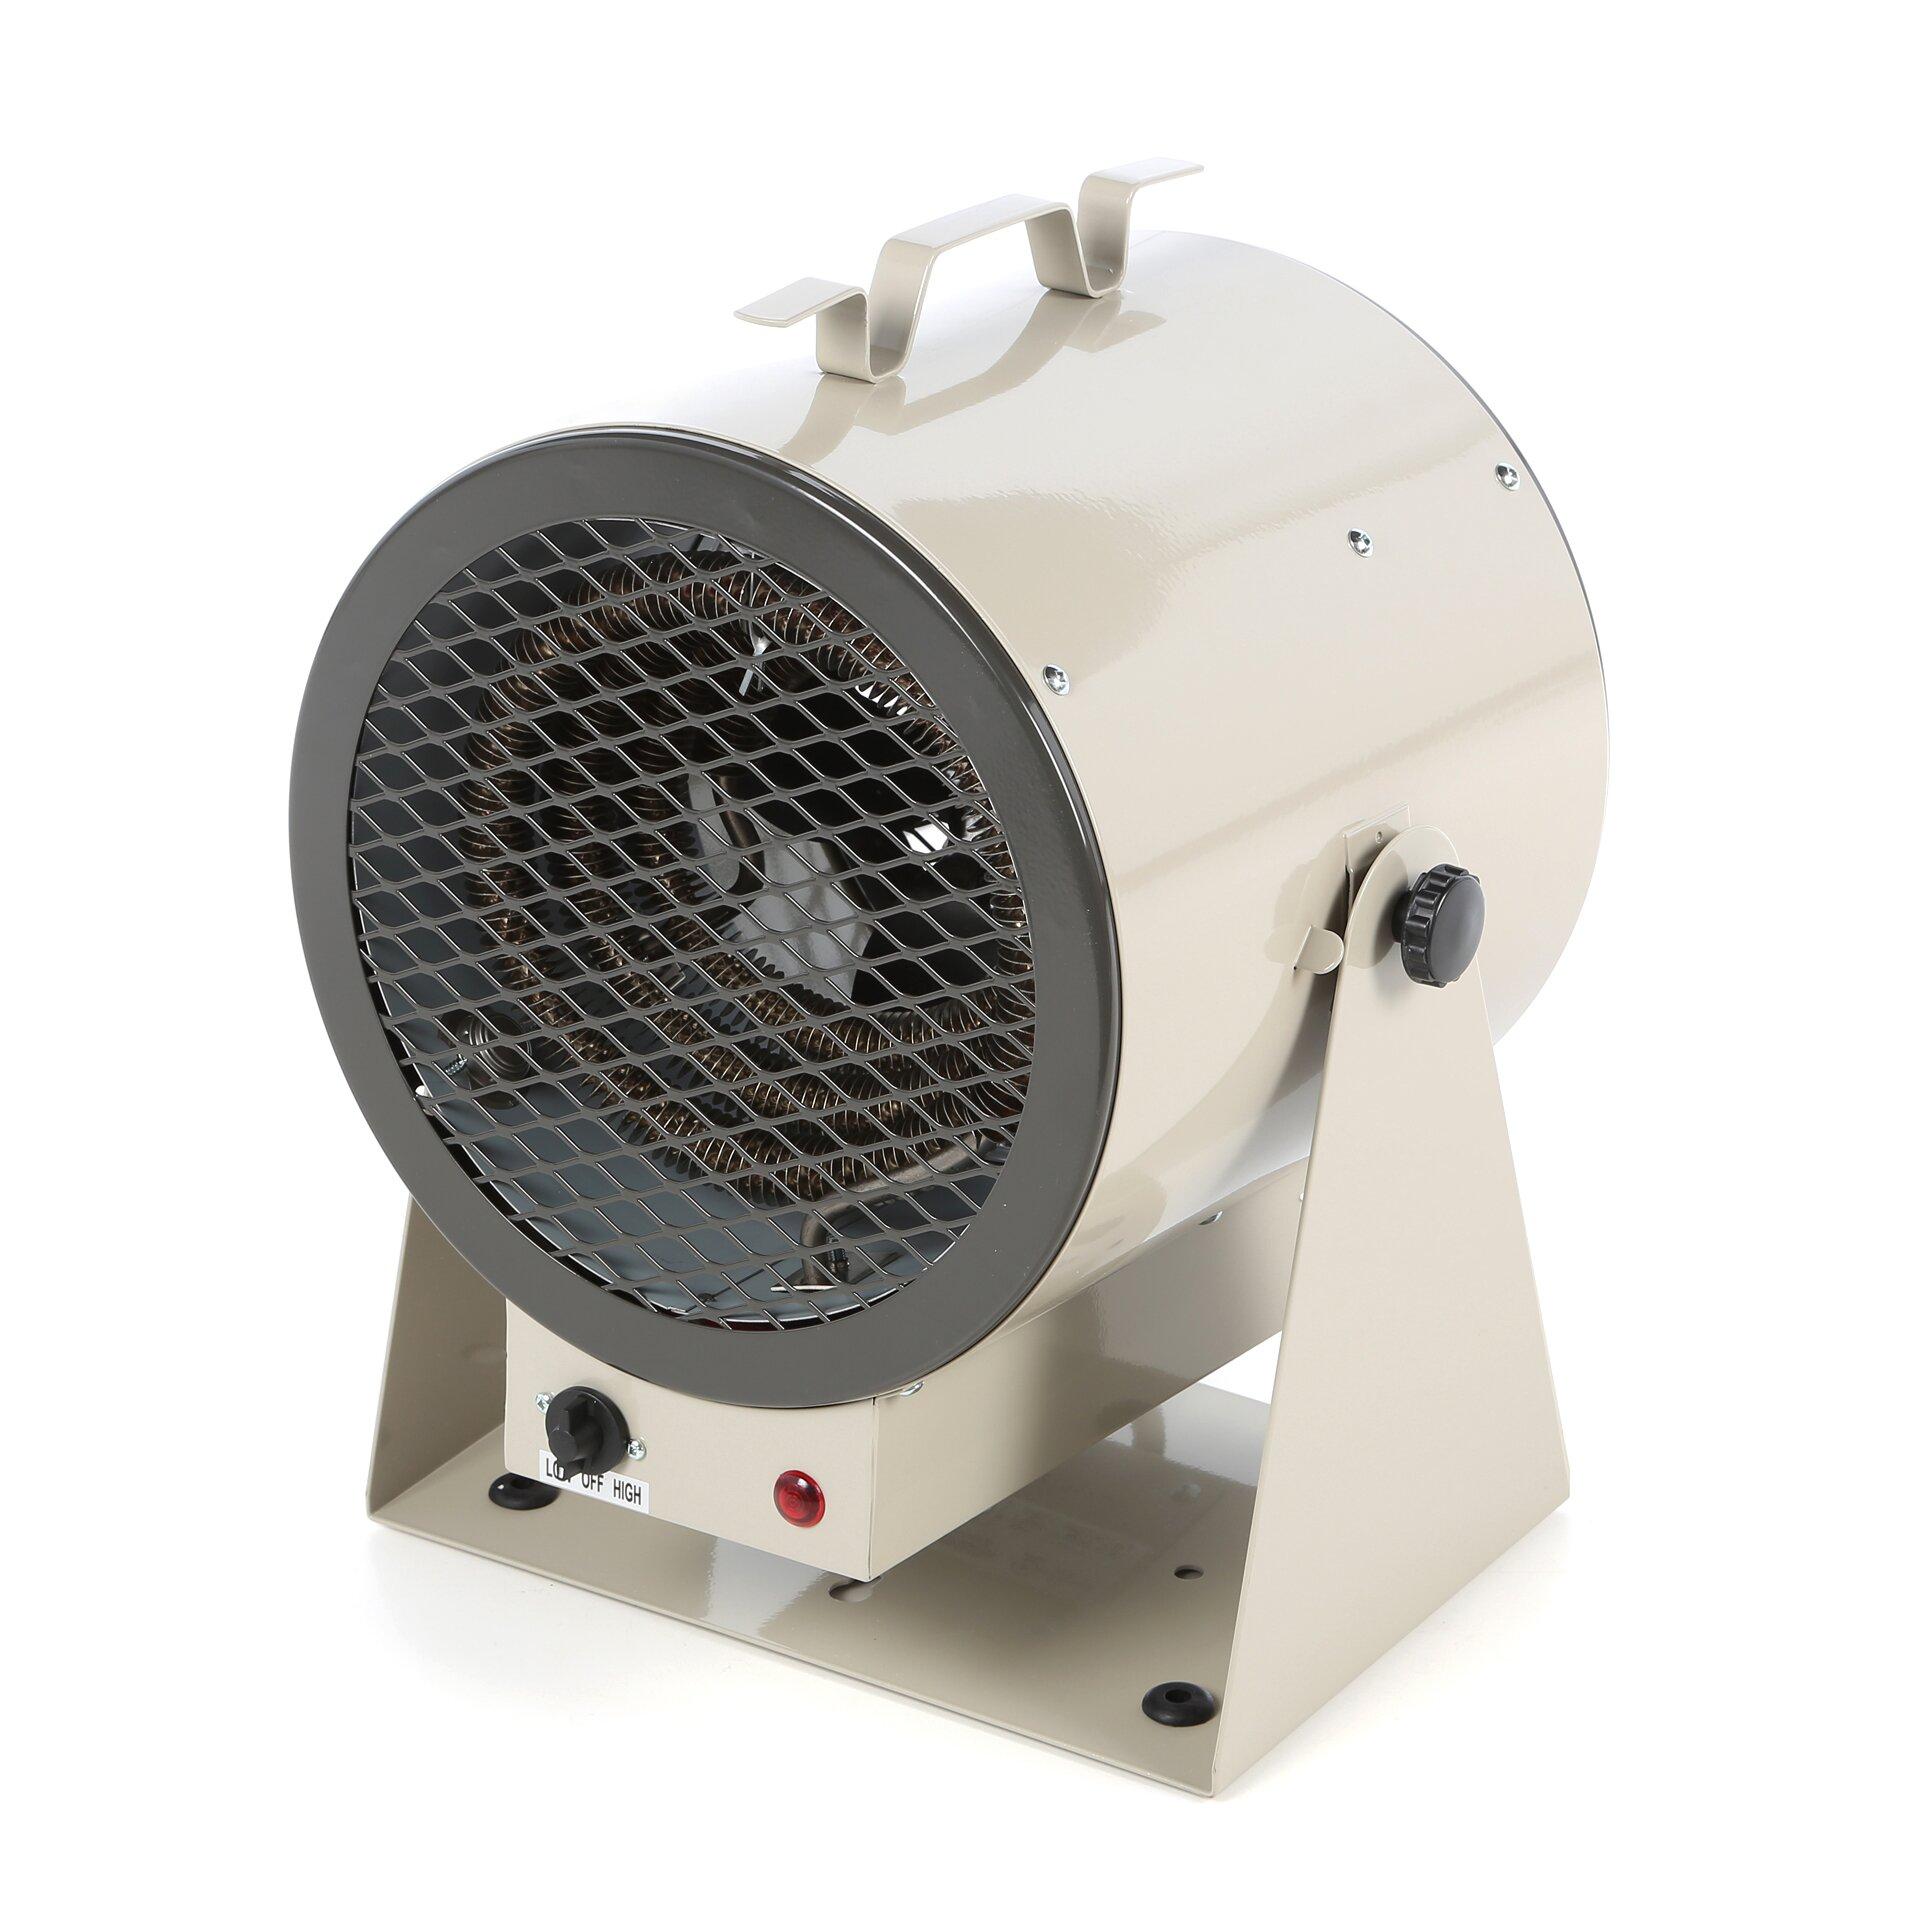 5 Portable Fan : Tpi portable electric fan utility heater reviews wayfair